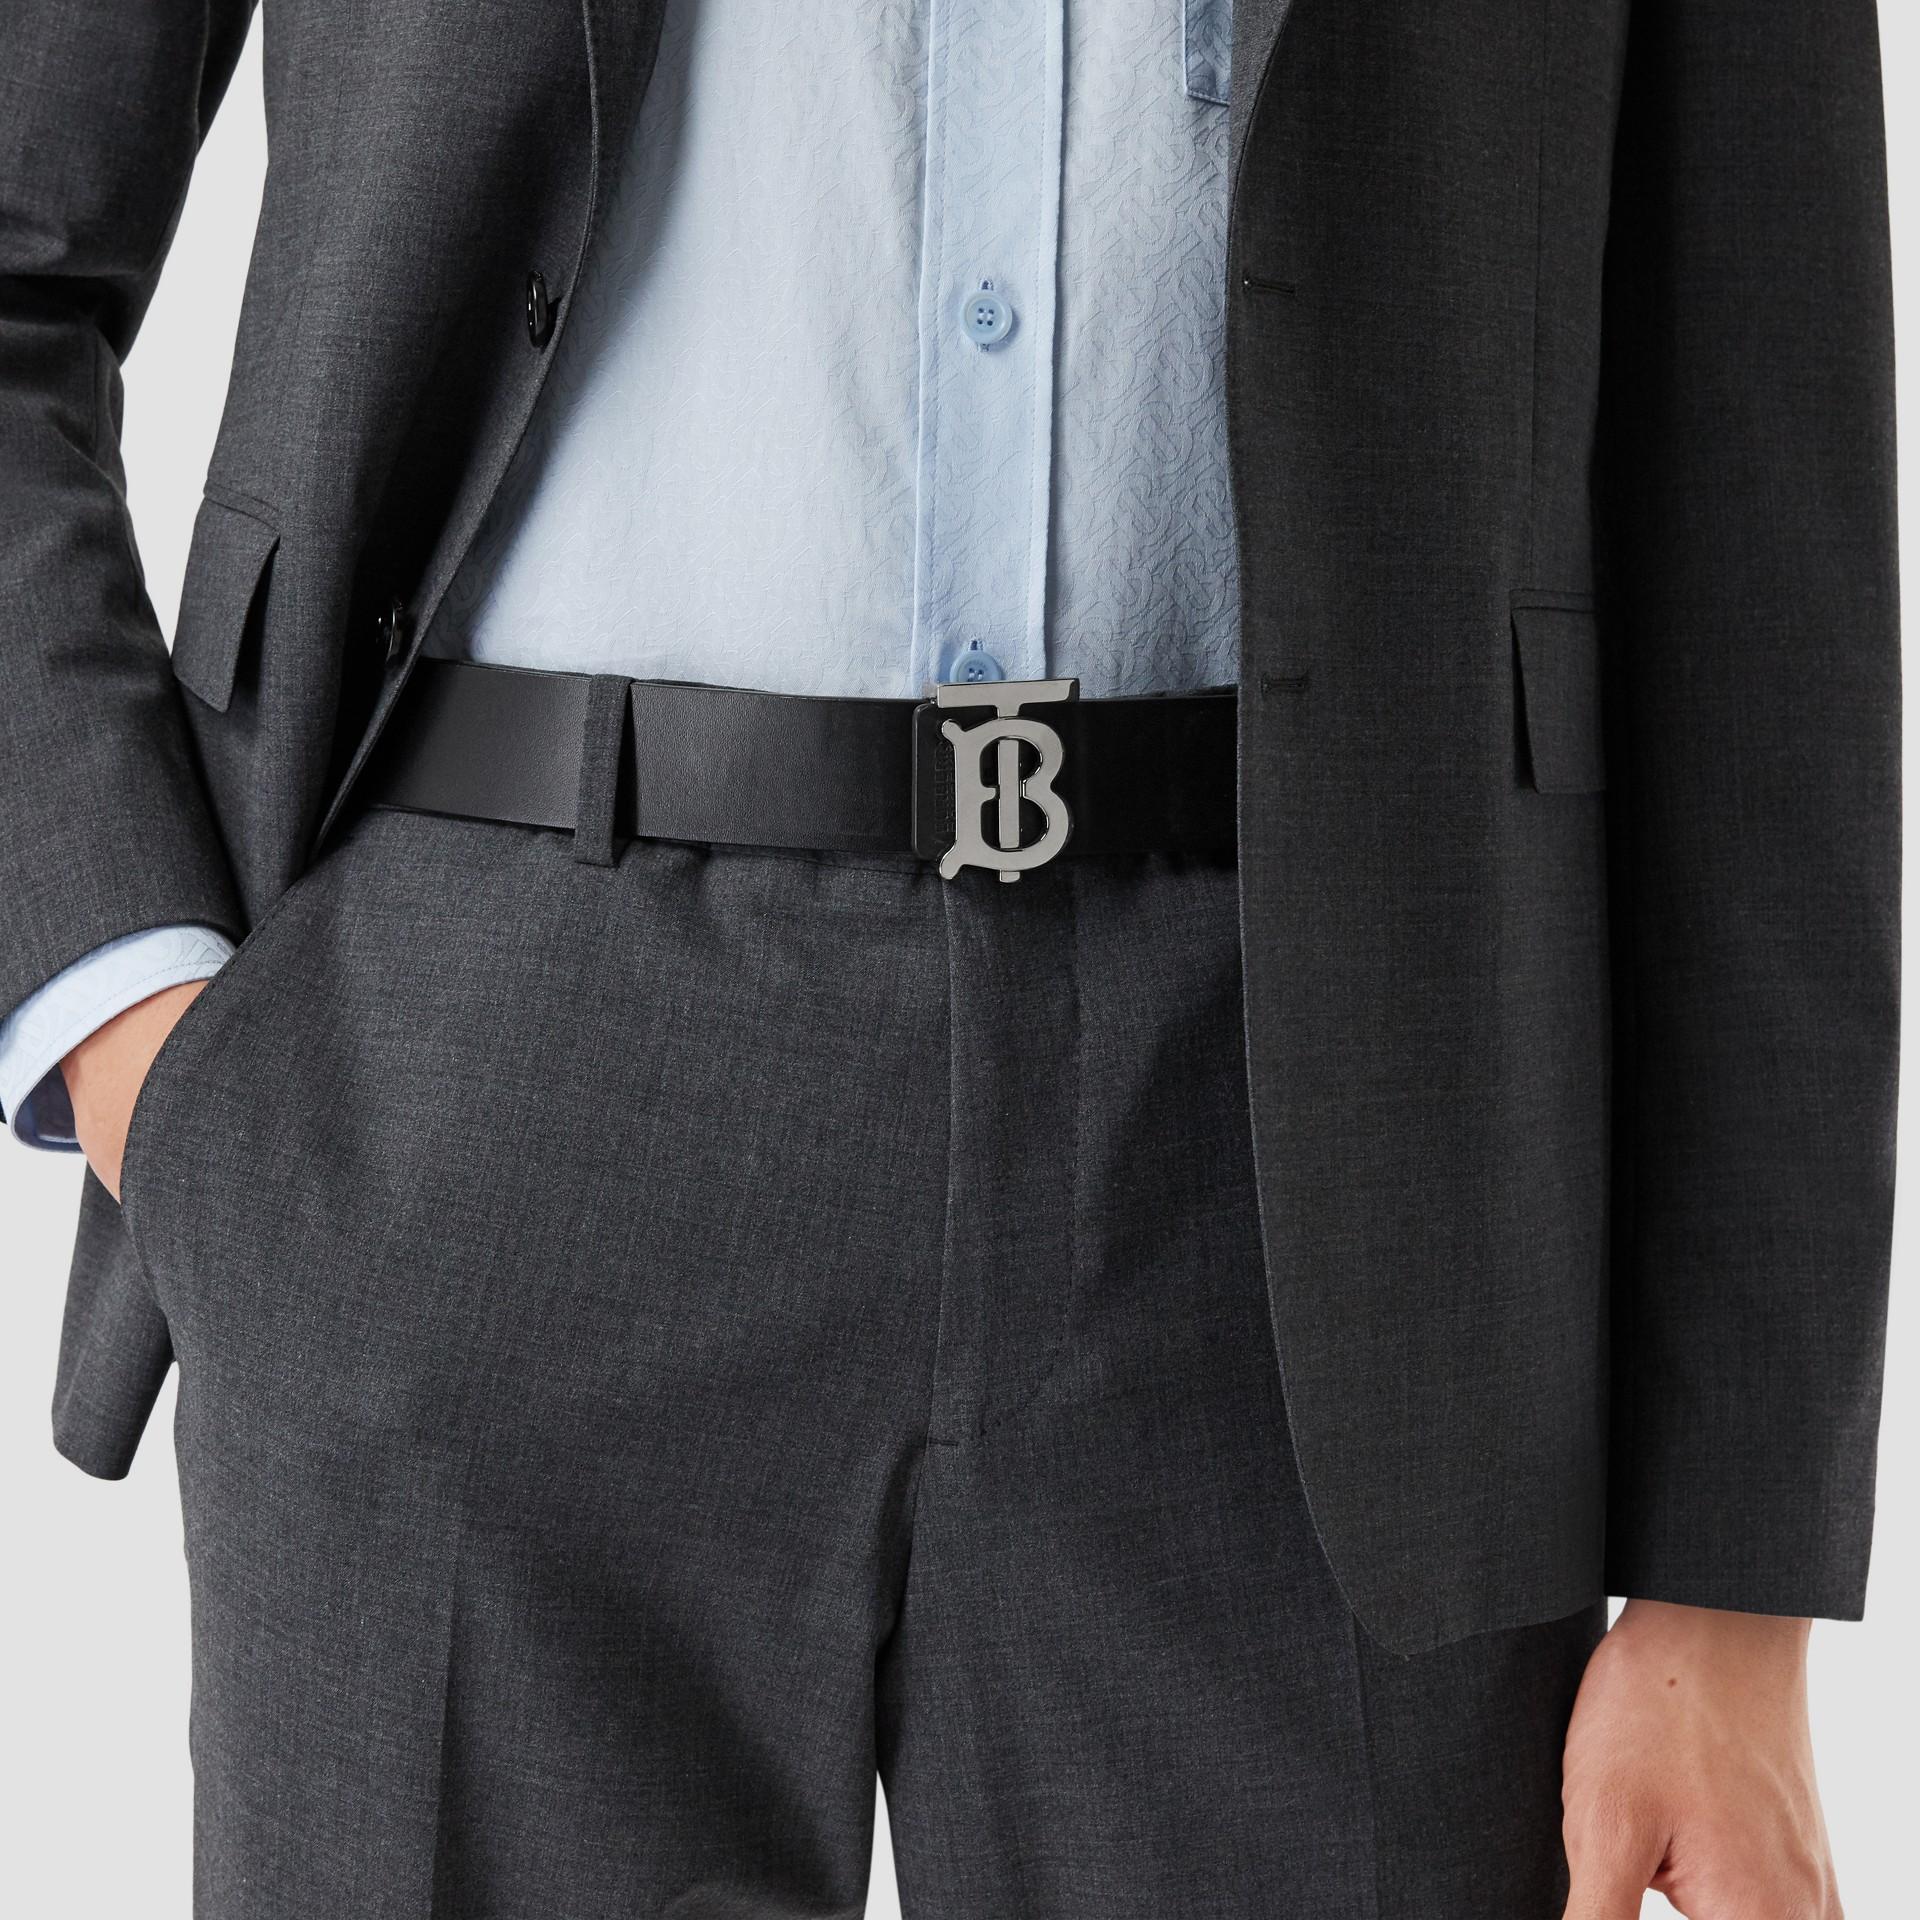 Reversible Monogram Motif Leather Belt in Navy/black - Men | Burberry United Kingdom - gallery image 1